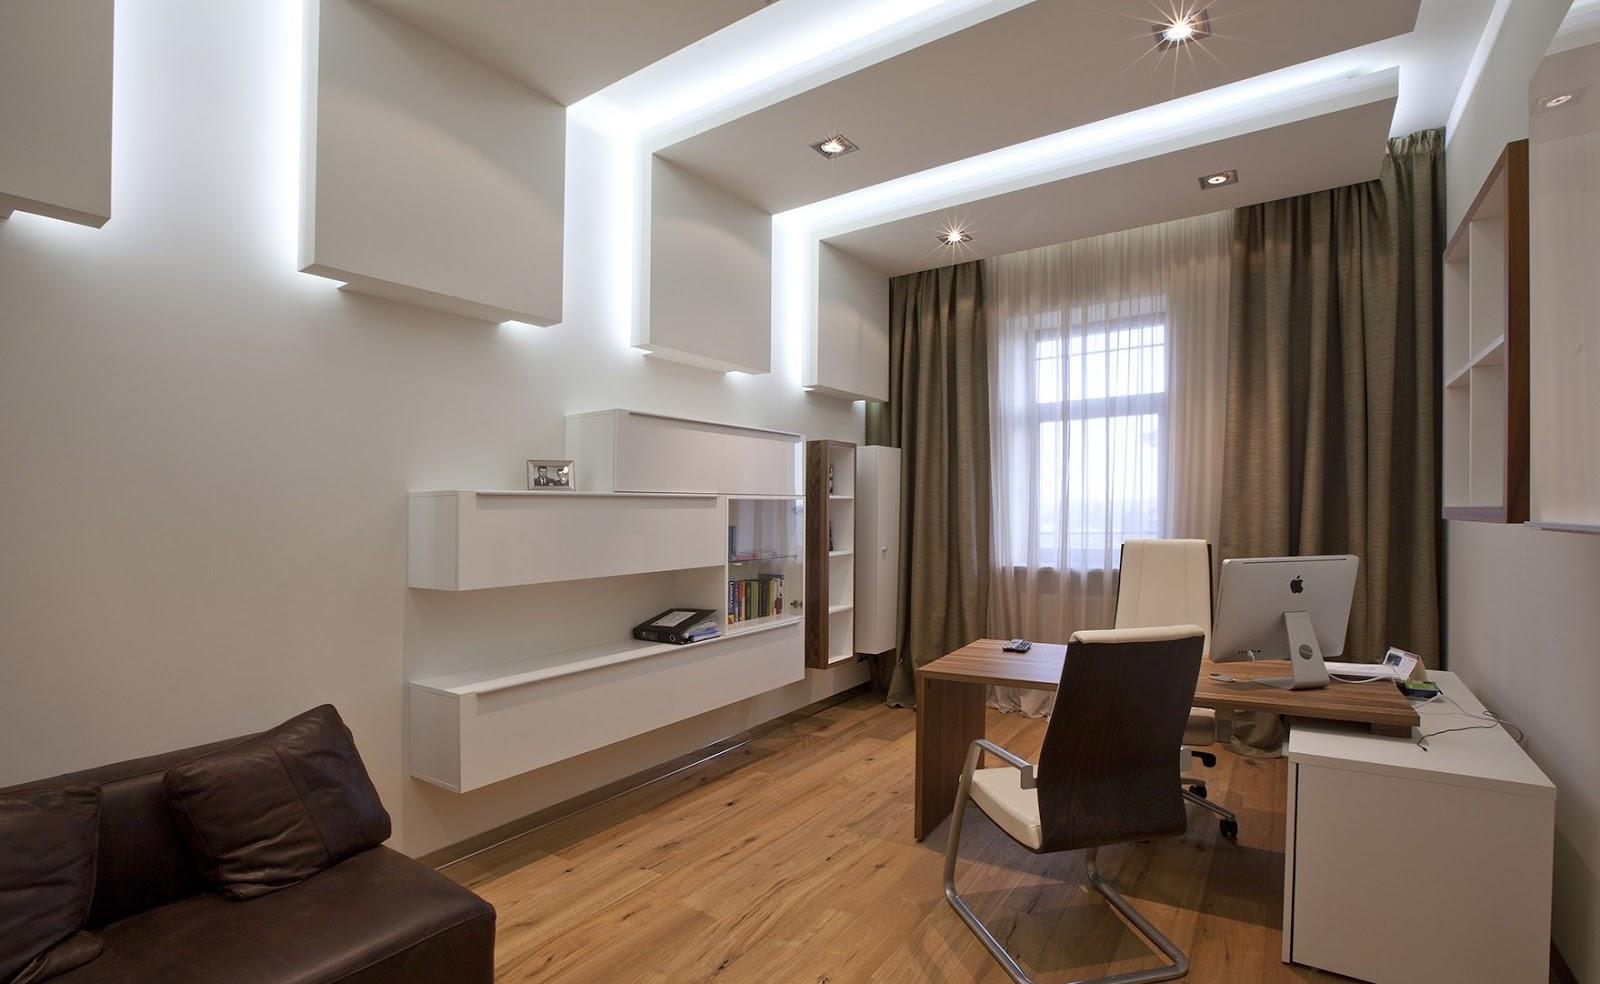 20 Office False Ceiling Design Ideas Materials Advantages